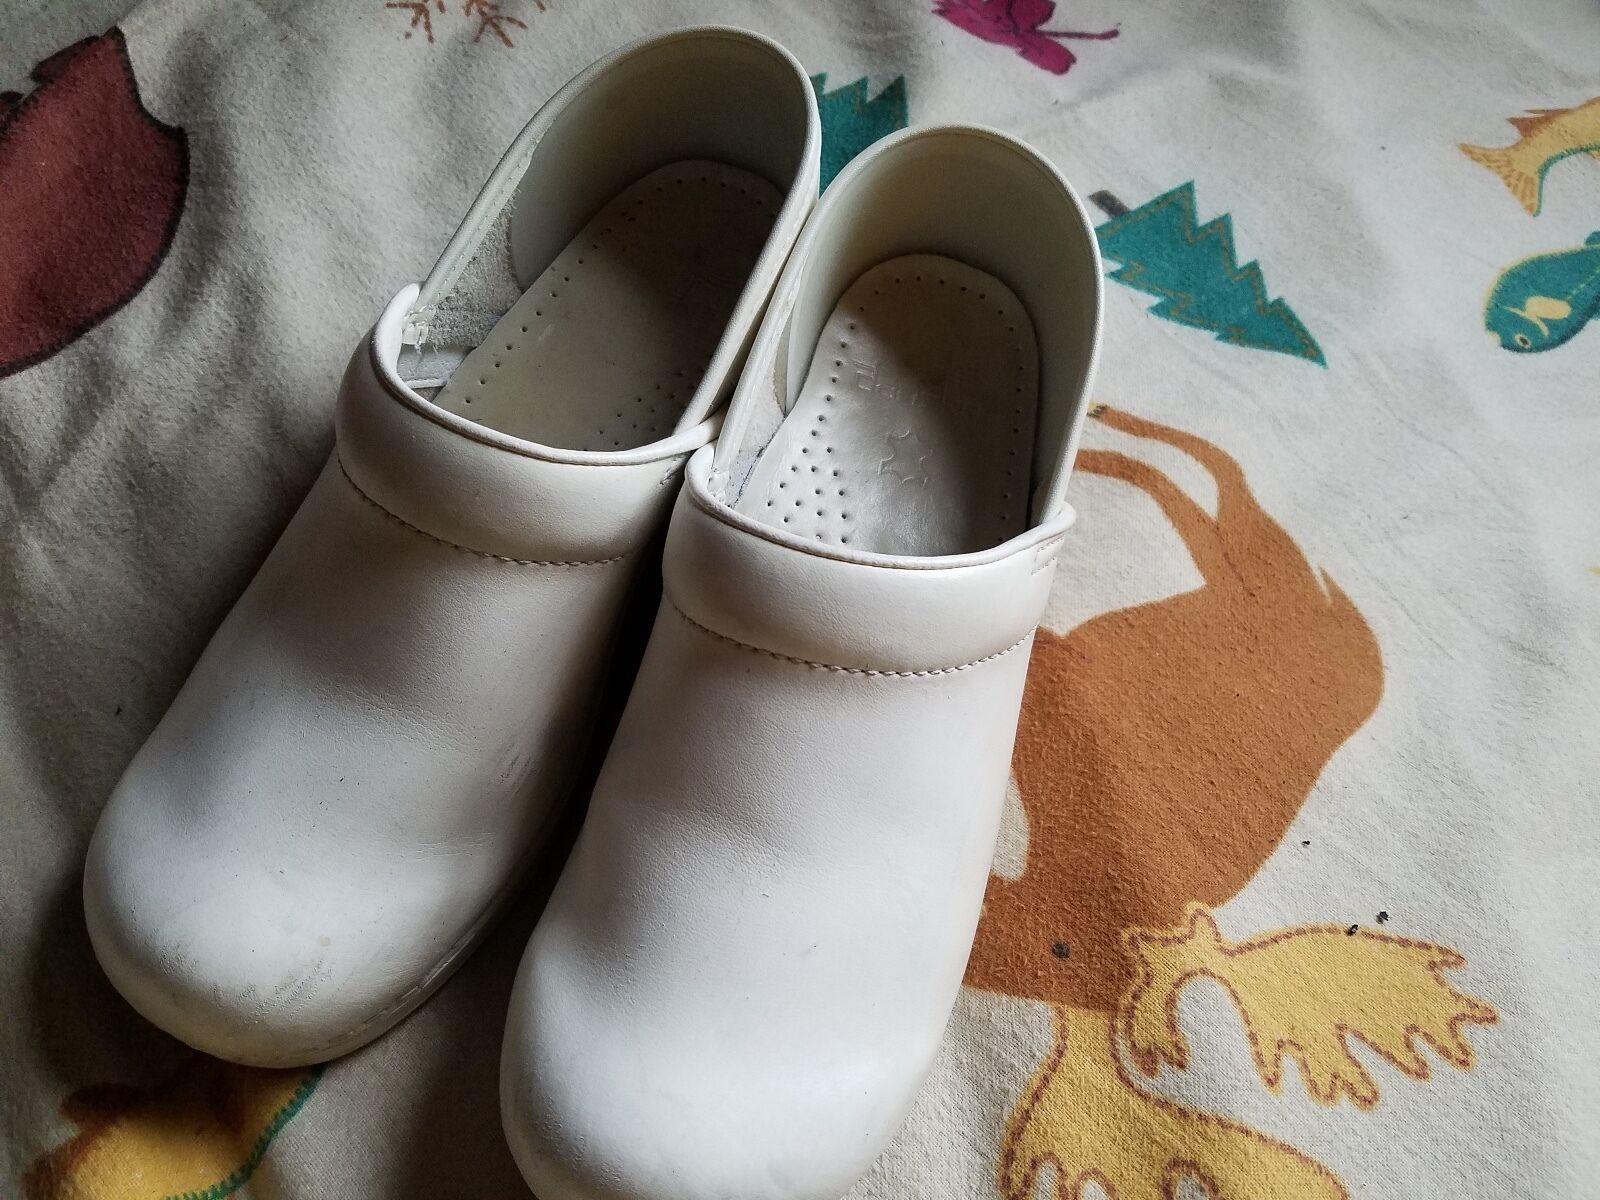 DANSKO WEISS LEATHER SLIP ON CLOG Schuhe SIZE 39